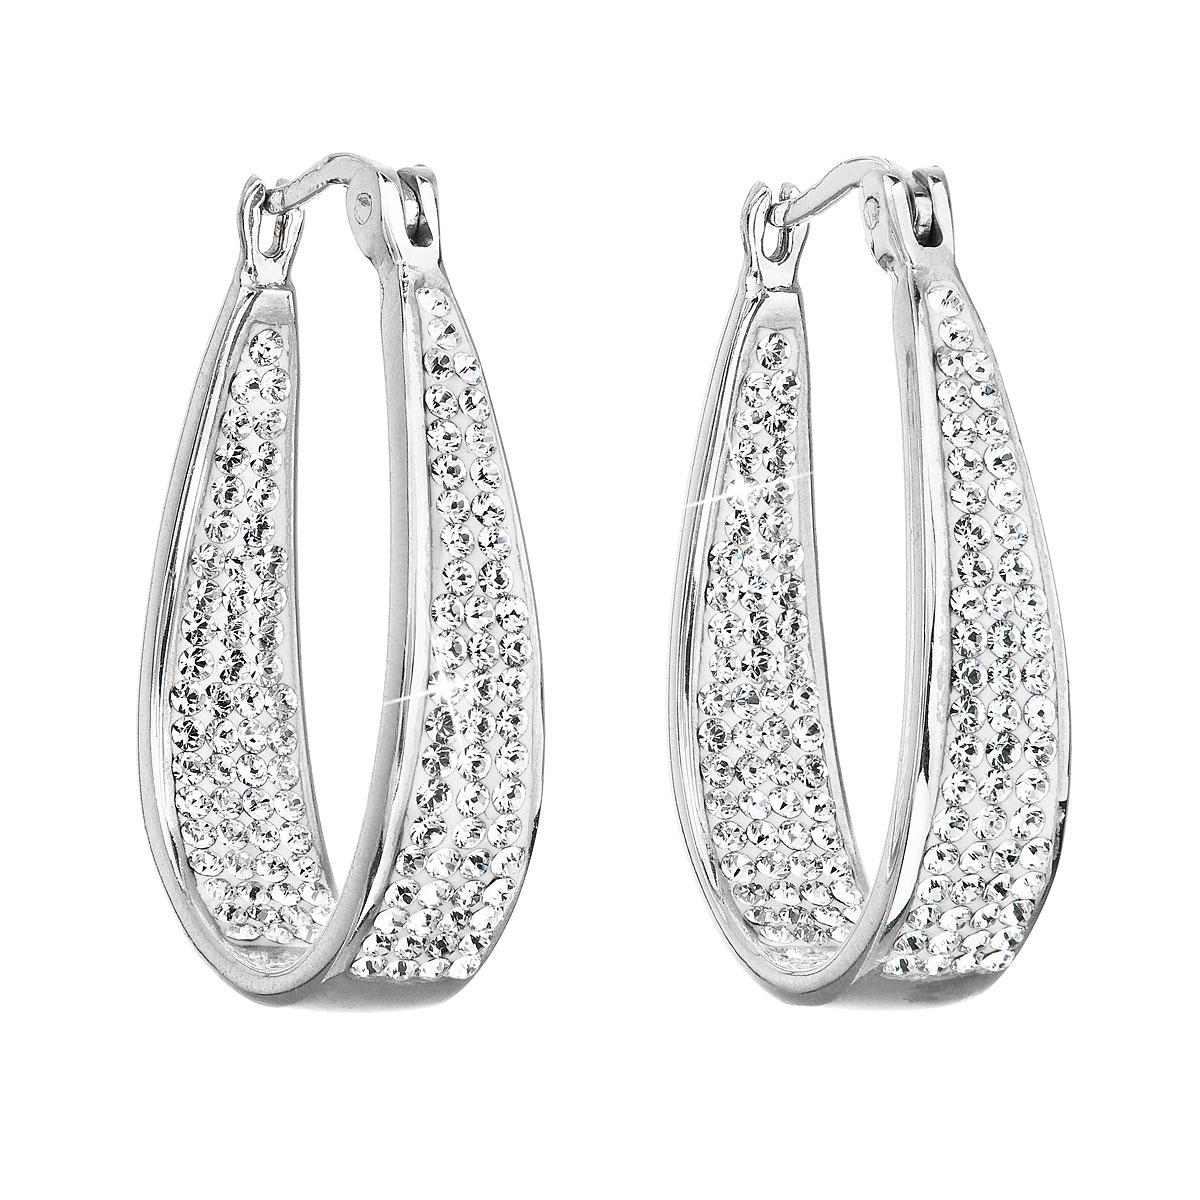 Stříbrné náušnice kruhy s krystaly Swarovski bílý kruh EG2089